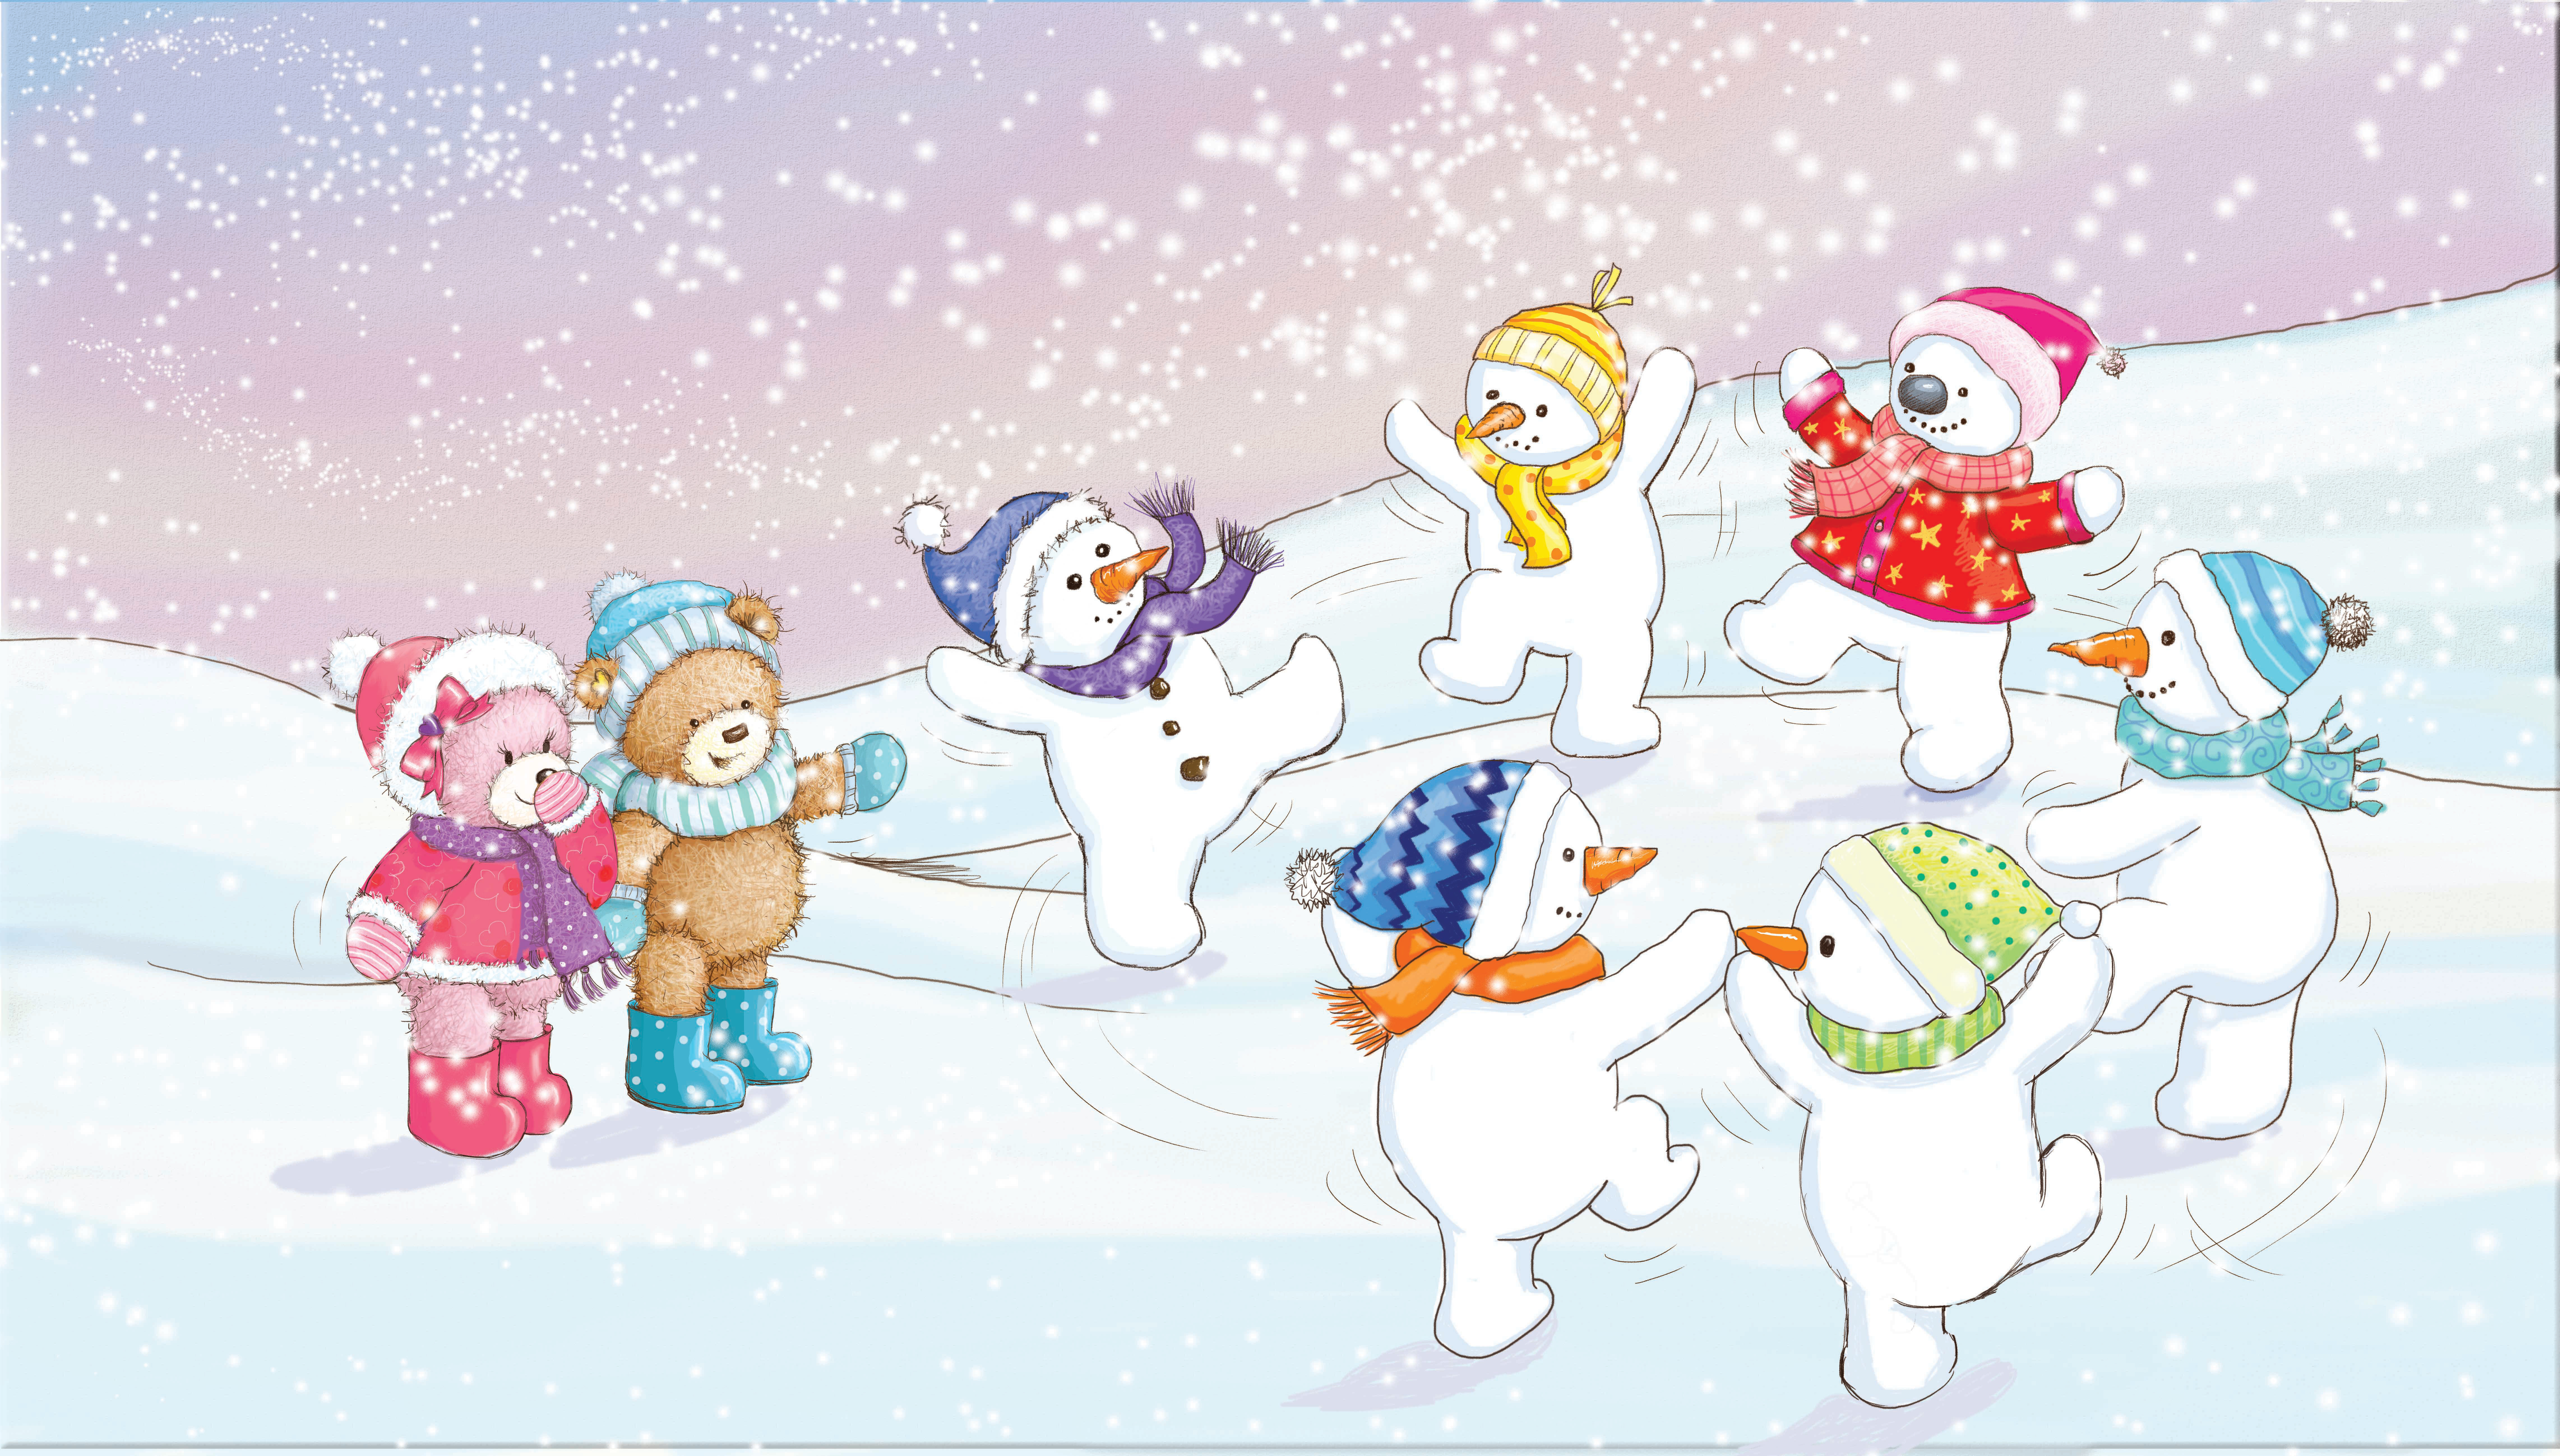 Popcorn the bear with dancing snowmen_gail yerrill_portfolio